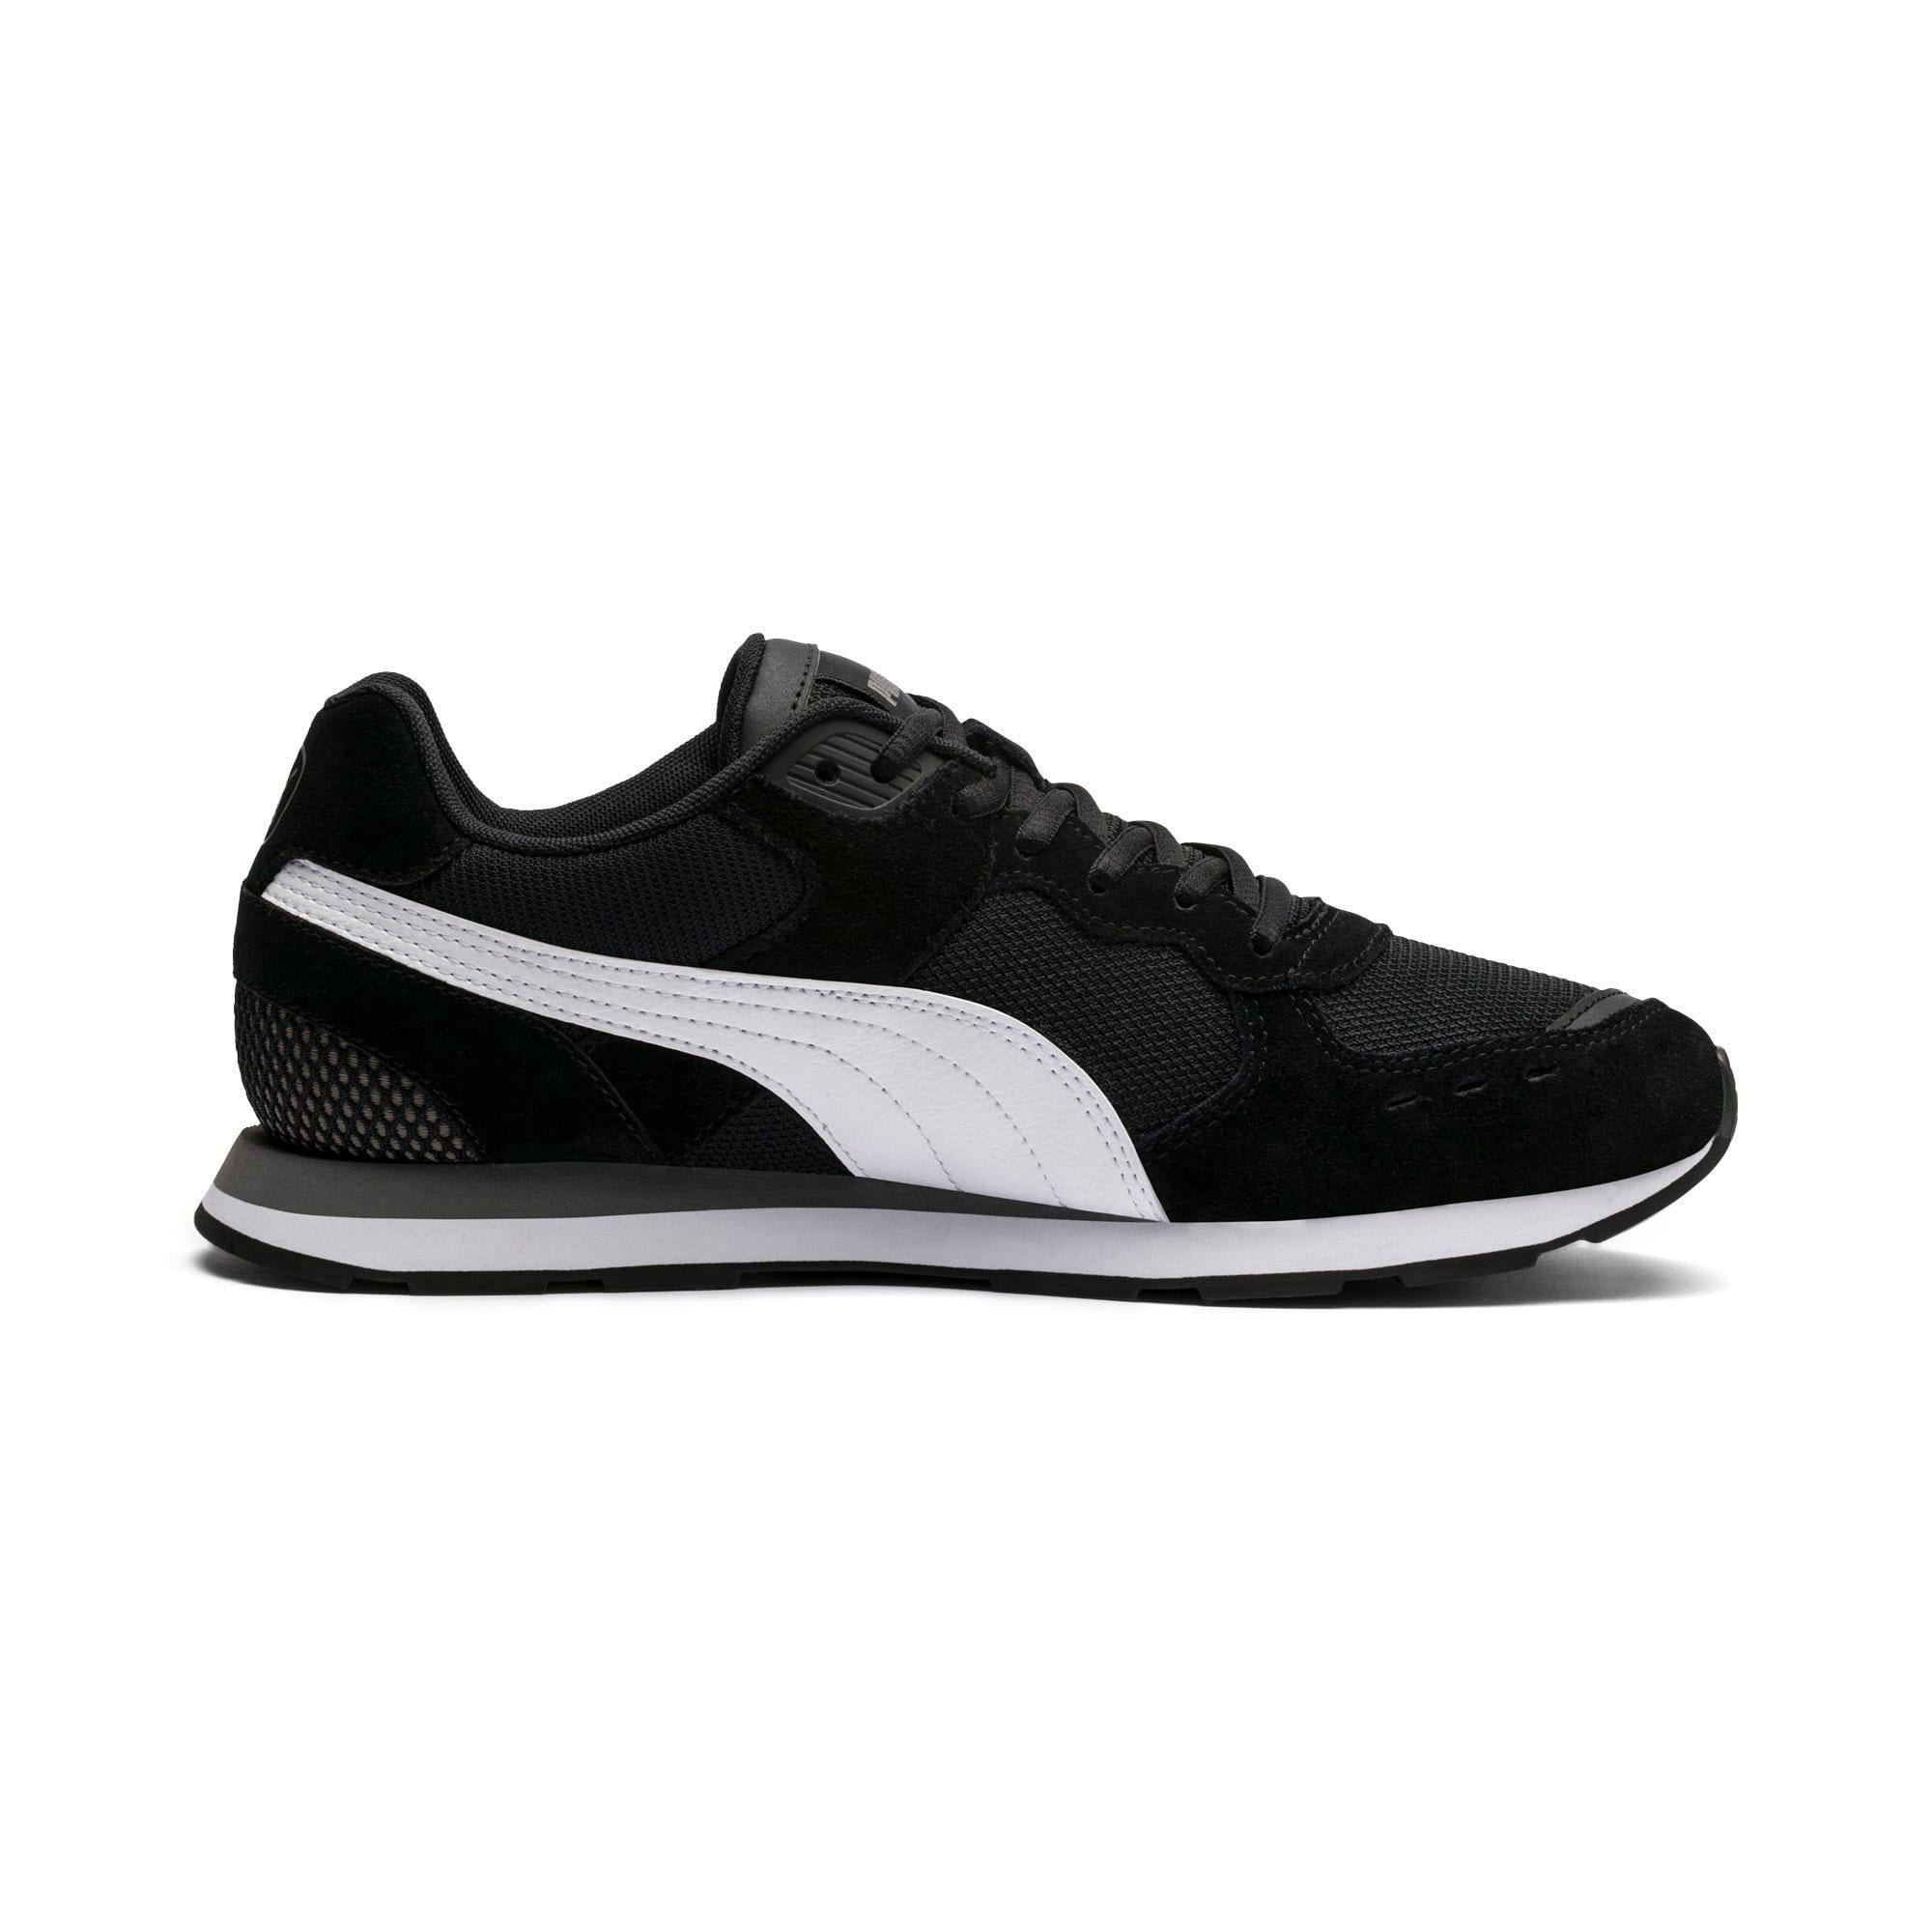 Miniatura 6 de Zapatos deportivos Vista, Black-White-Charcoal Gray, mediano